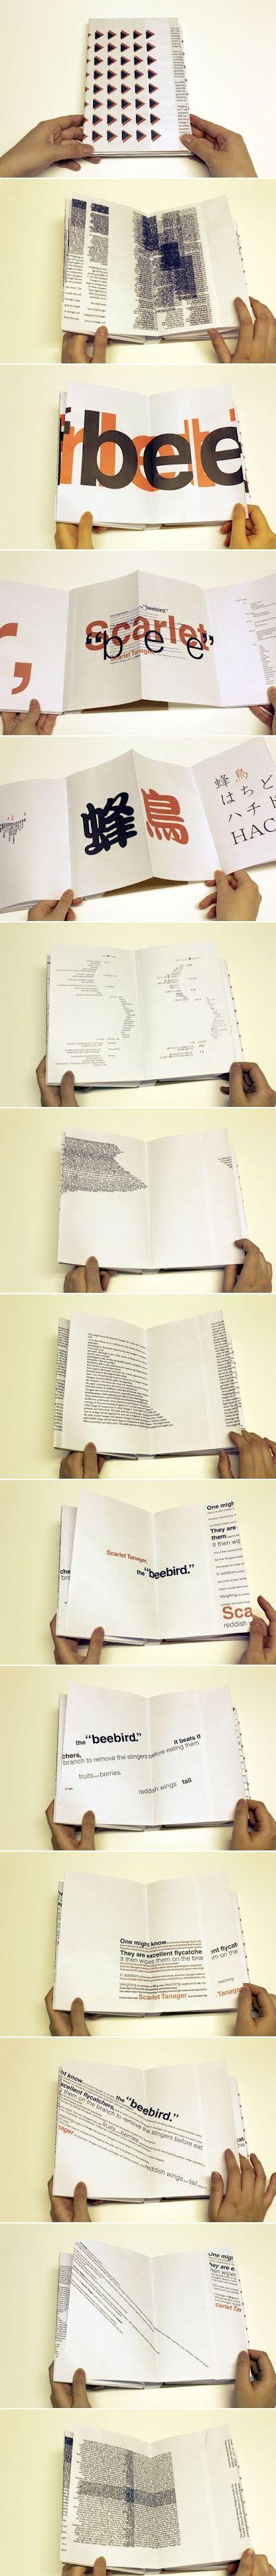 Book Design: Experimental Typography